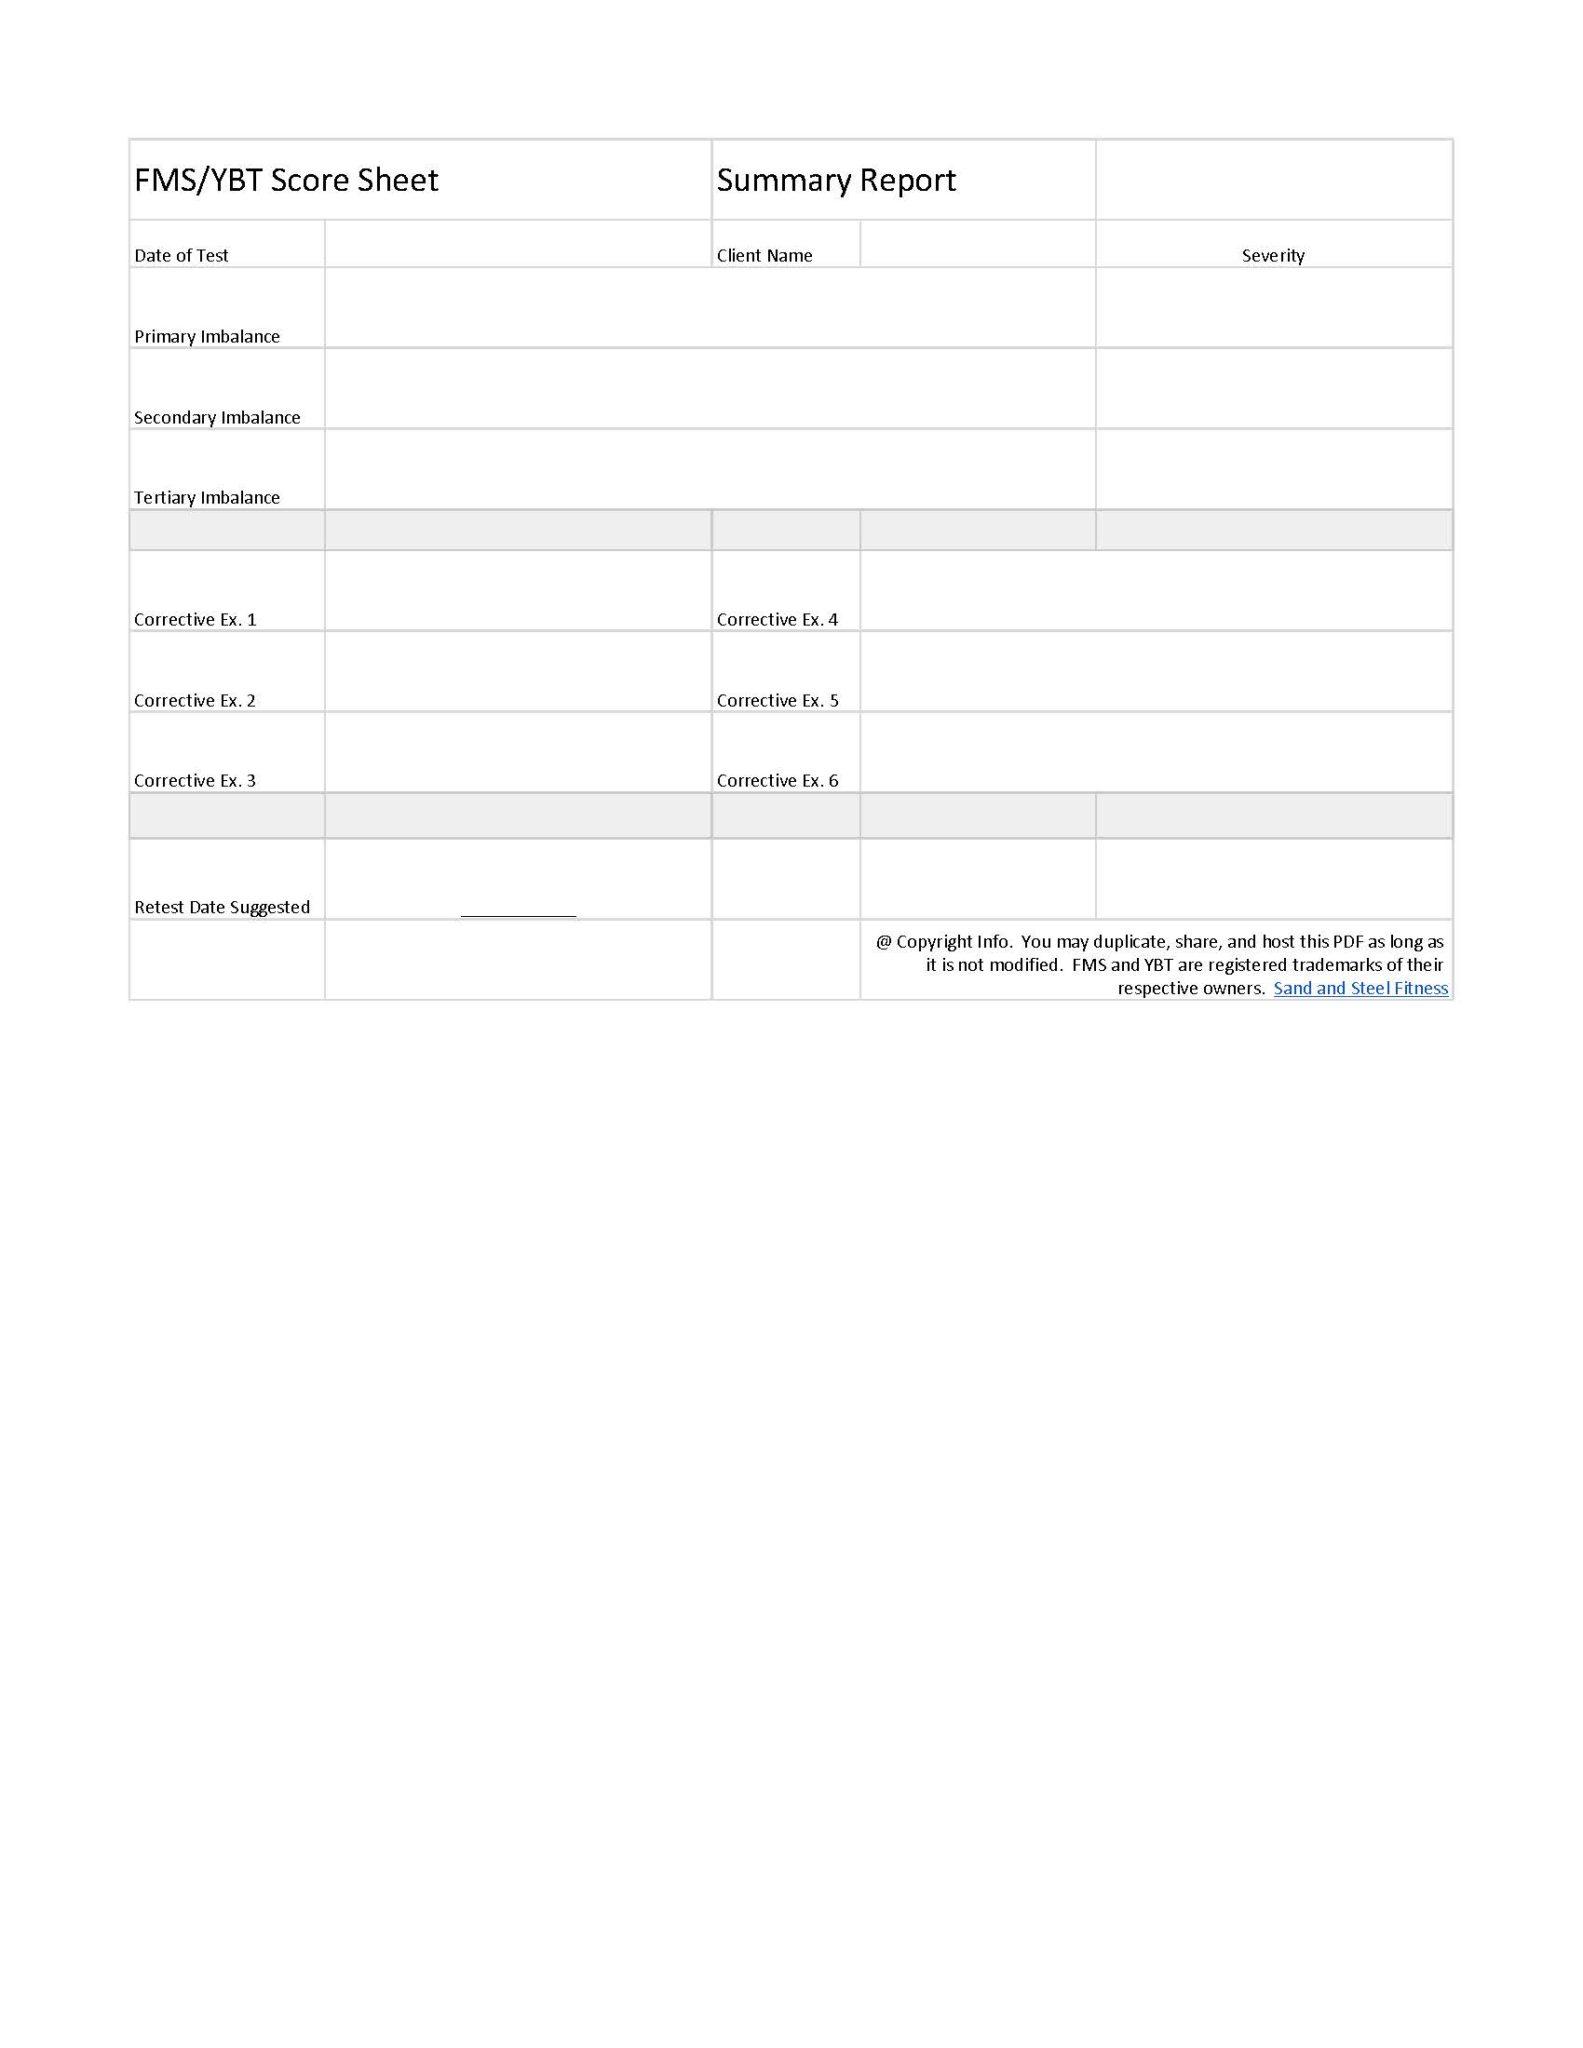 FMS + YBT Score Report Sheet